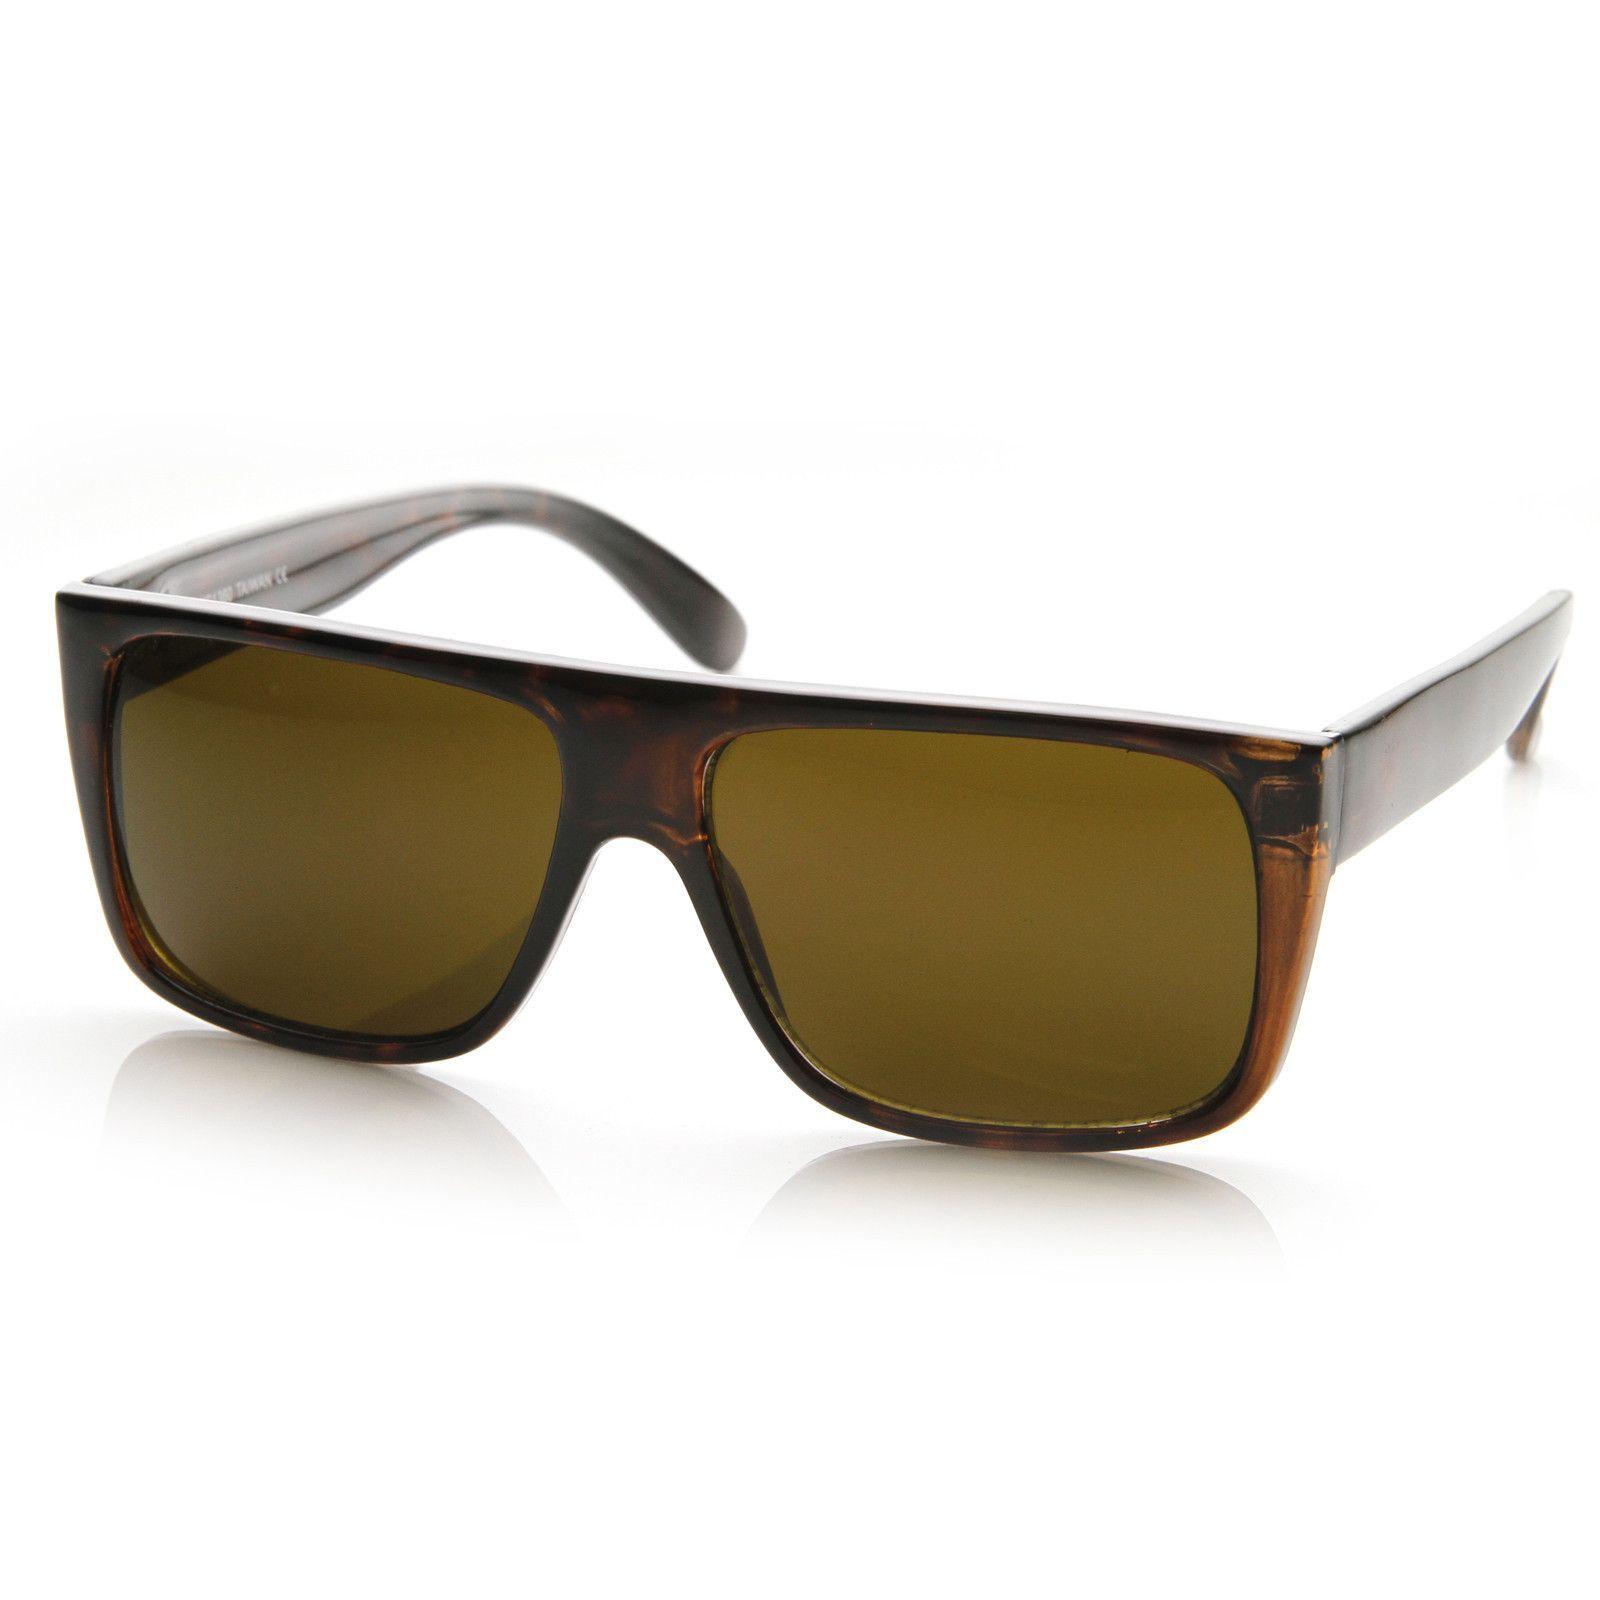 Mens Retro Super Flat Top Aviator Square Sunglasses 8685